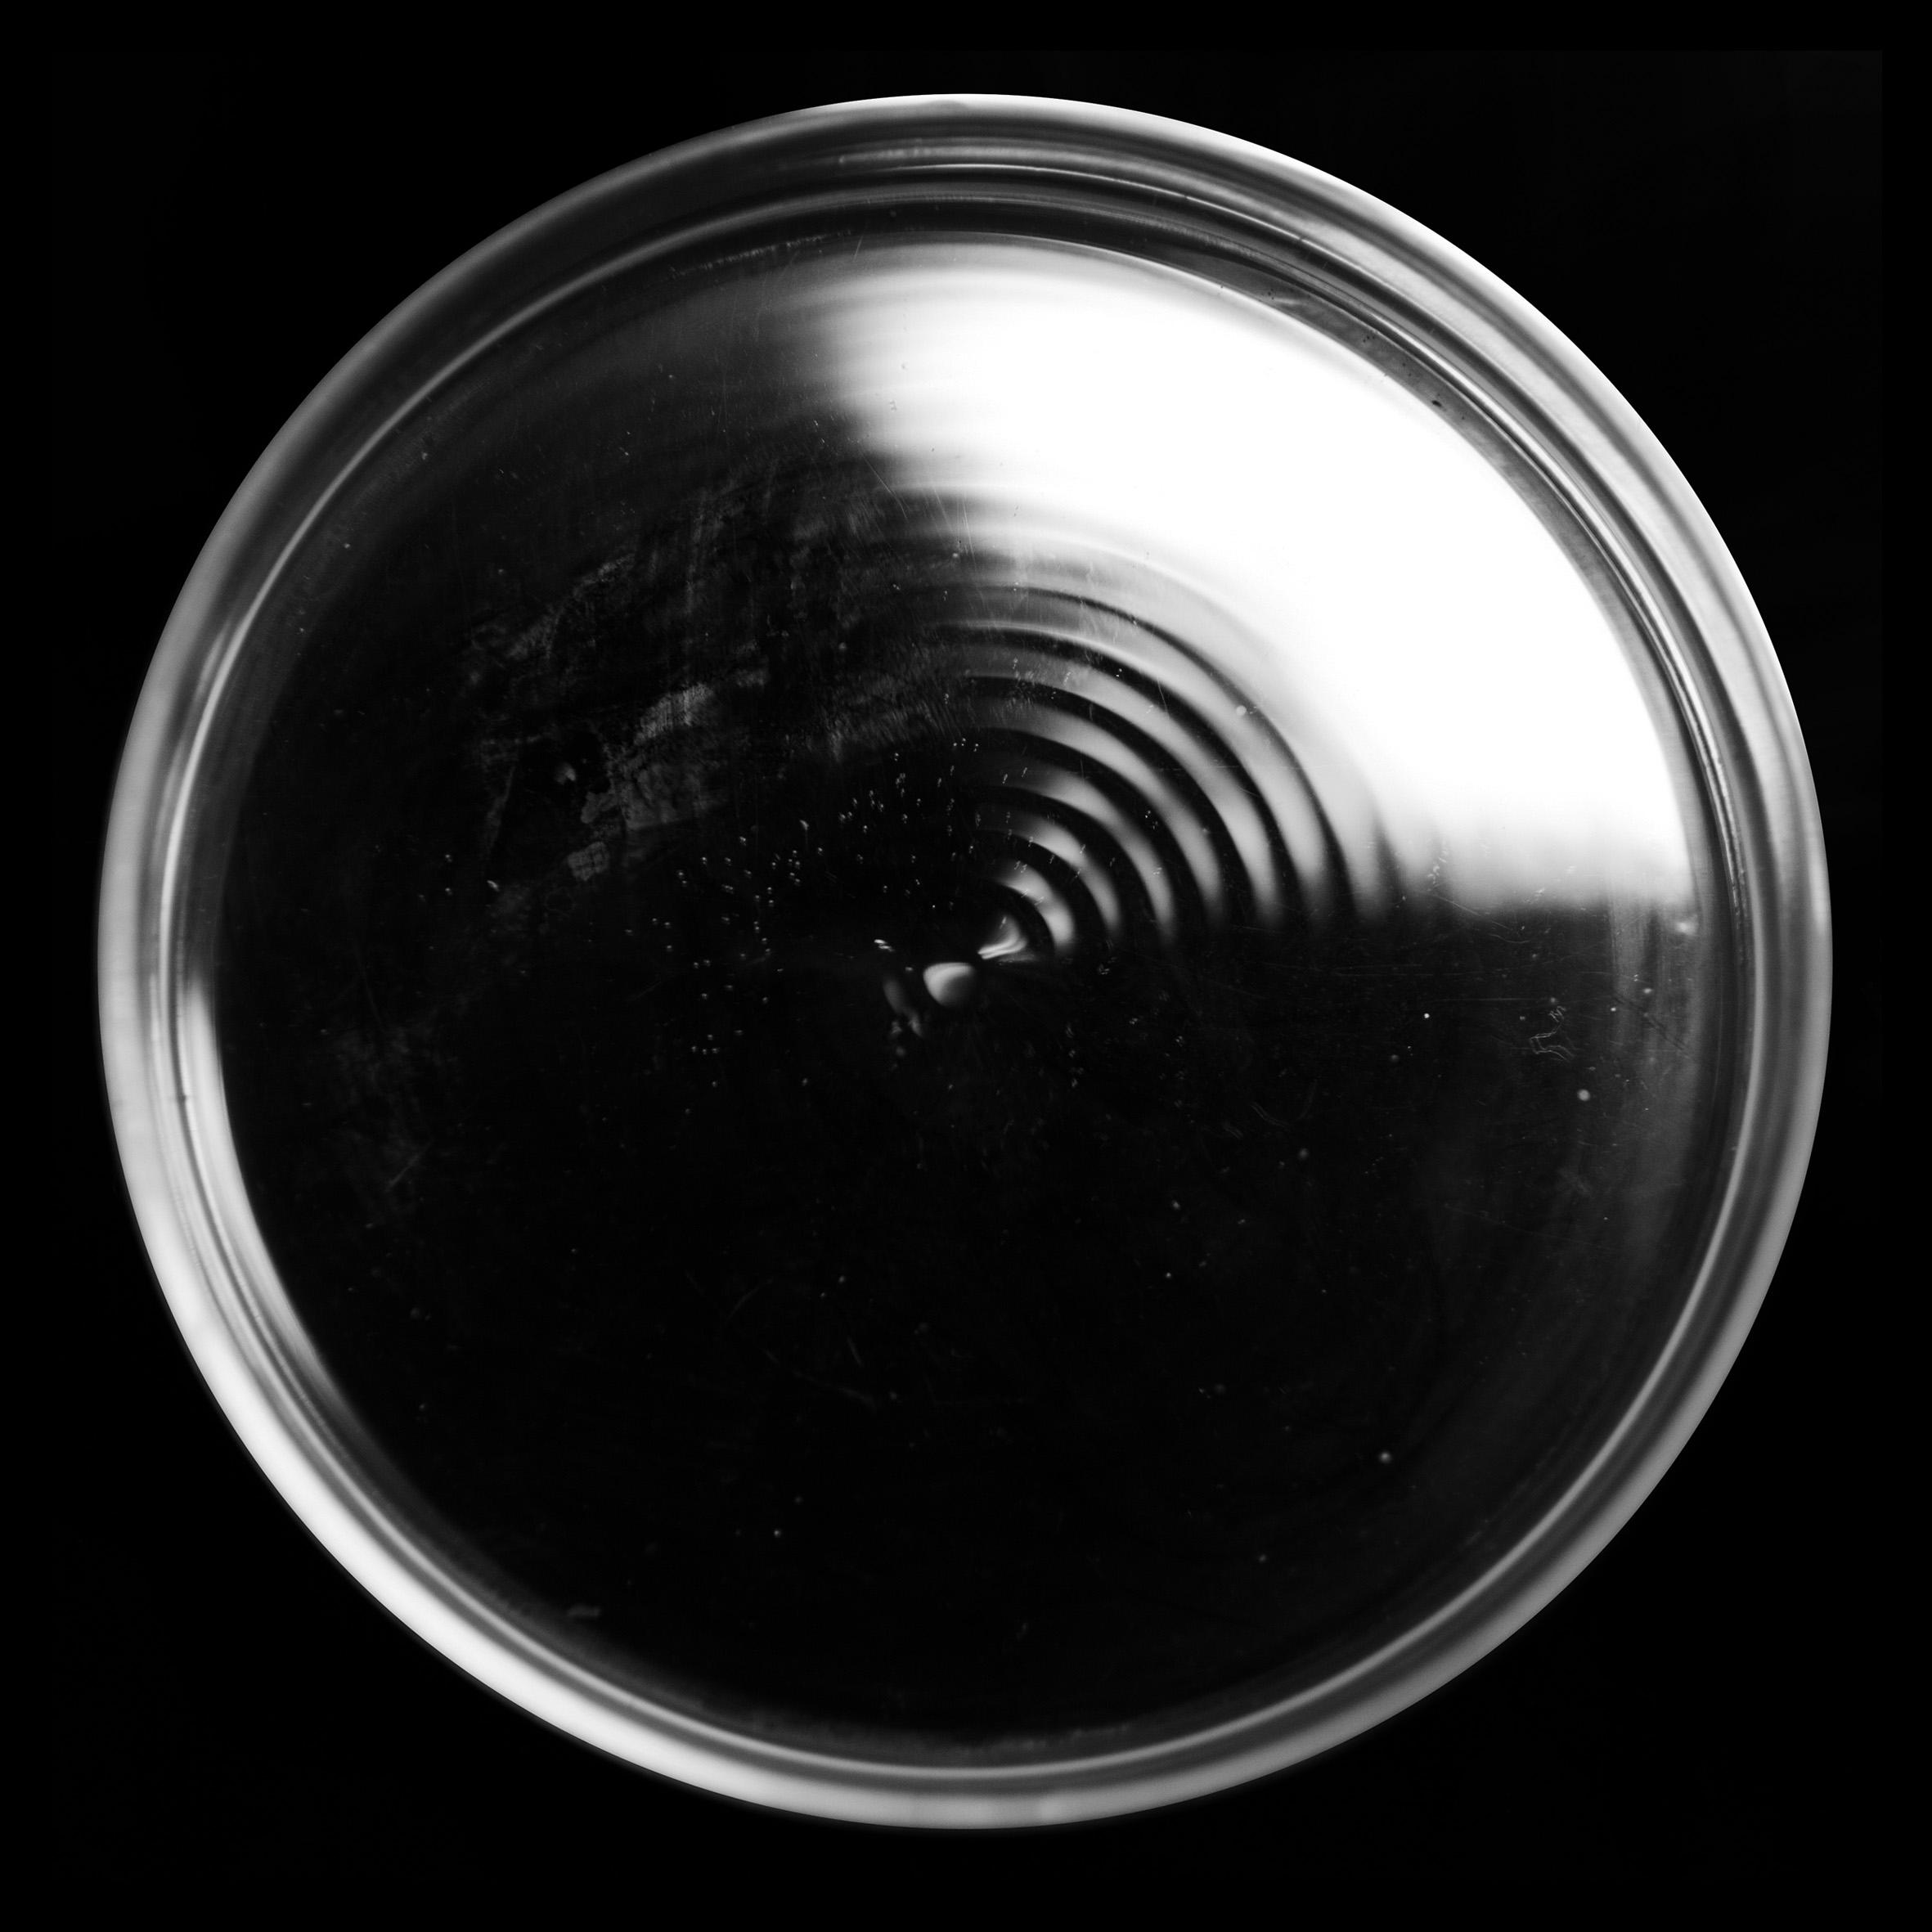 Hz-15. 30Hz Tonoscoop-patroon